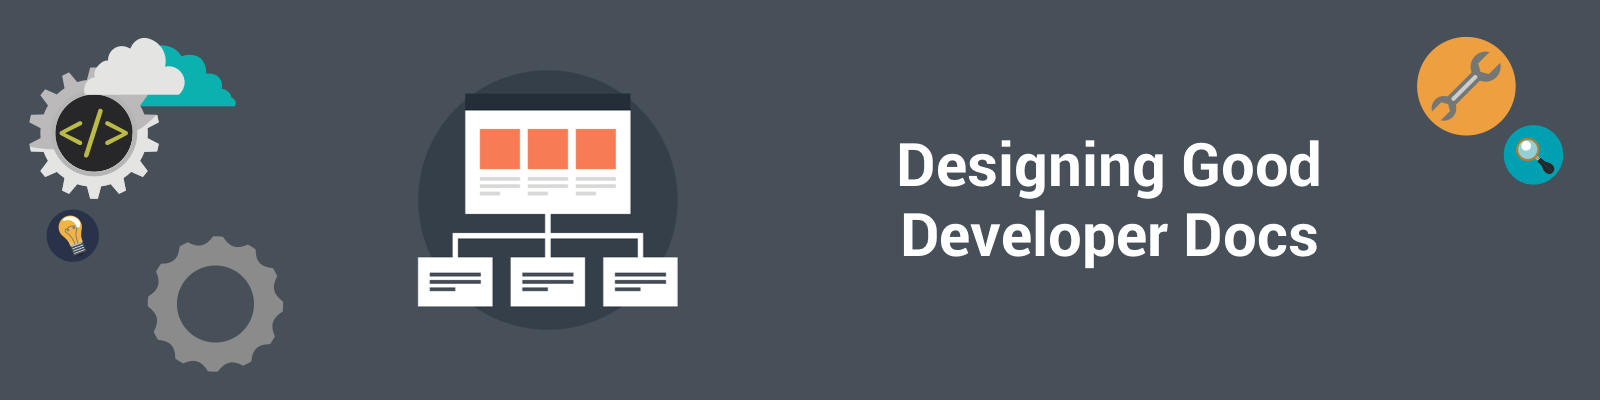 Designing Good Static REST API Documentation